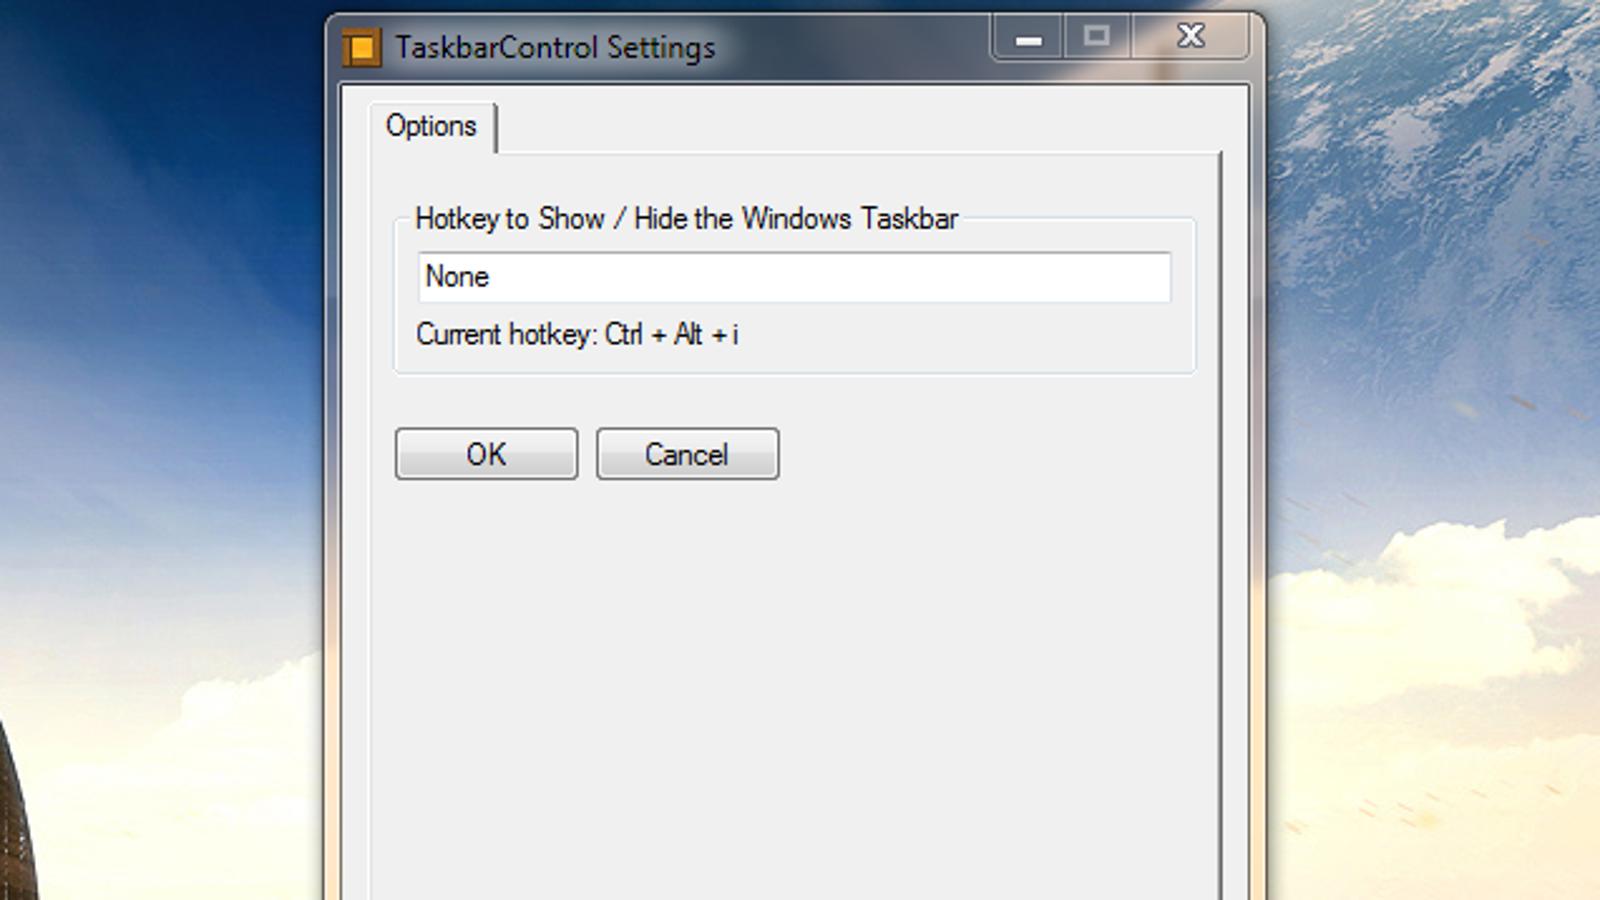 Taskbar Control Hides And Unhides The Windows Taskbar With